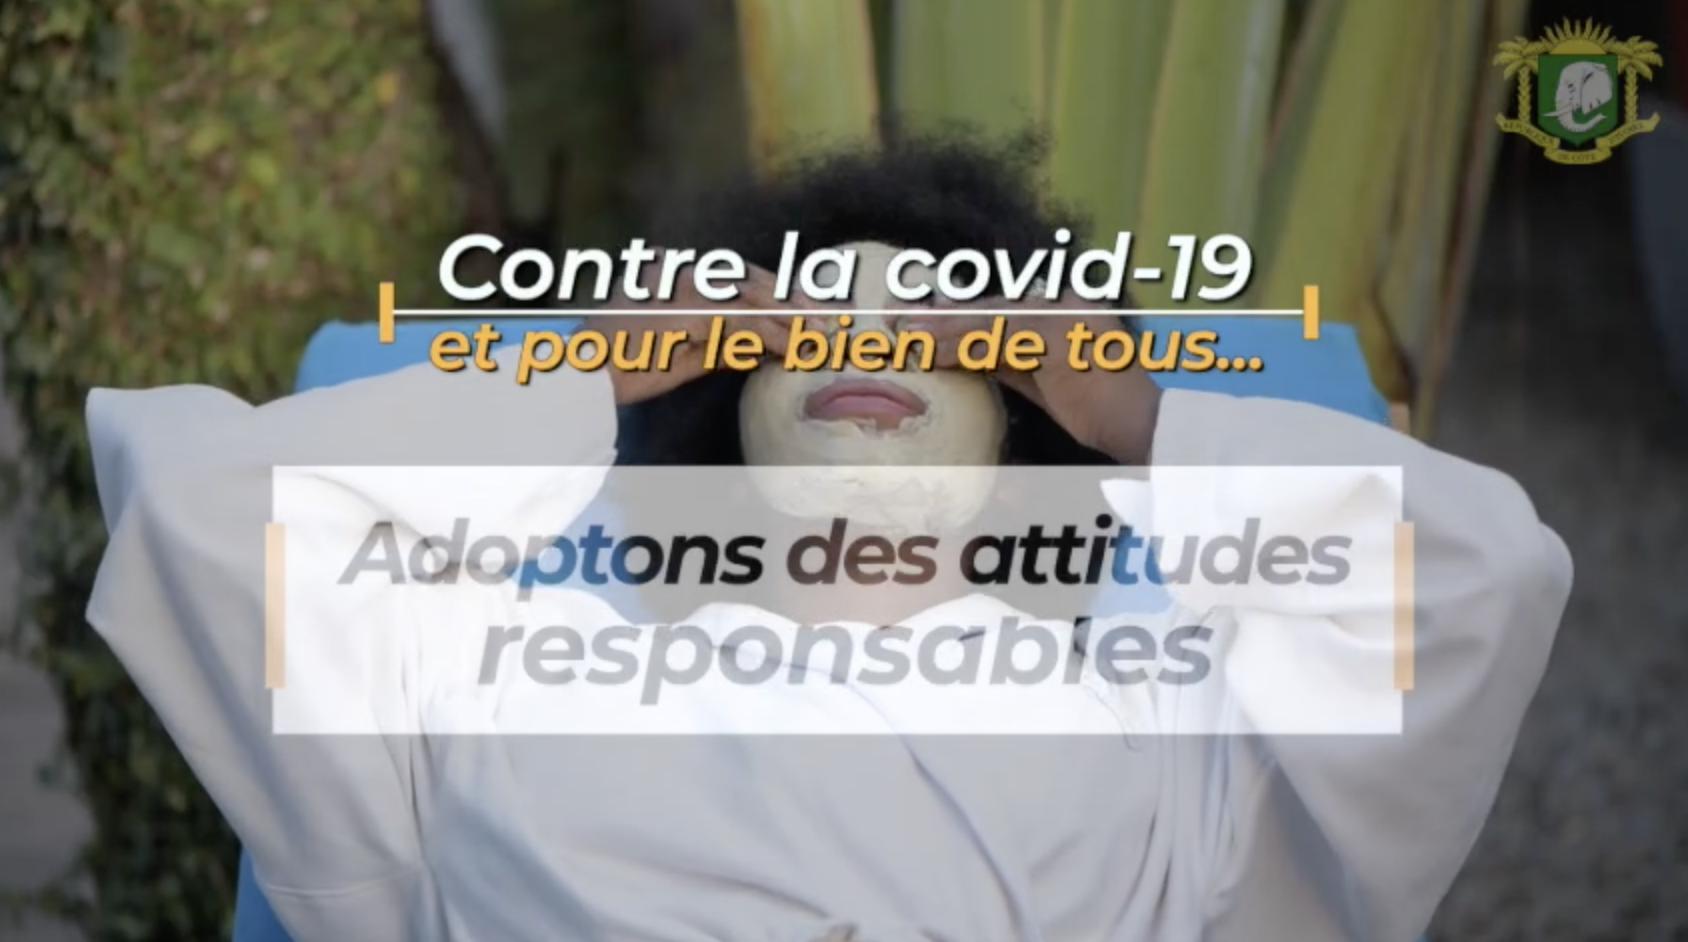 Contre la COVID, adoptons des attitudes responsables…